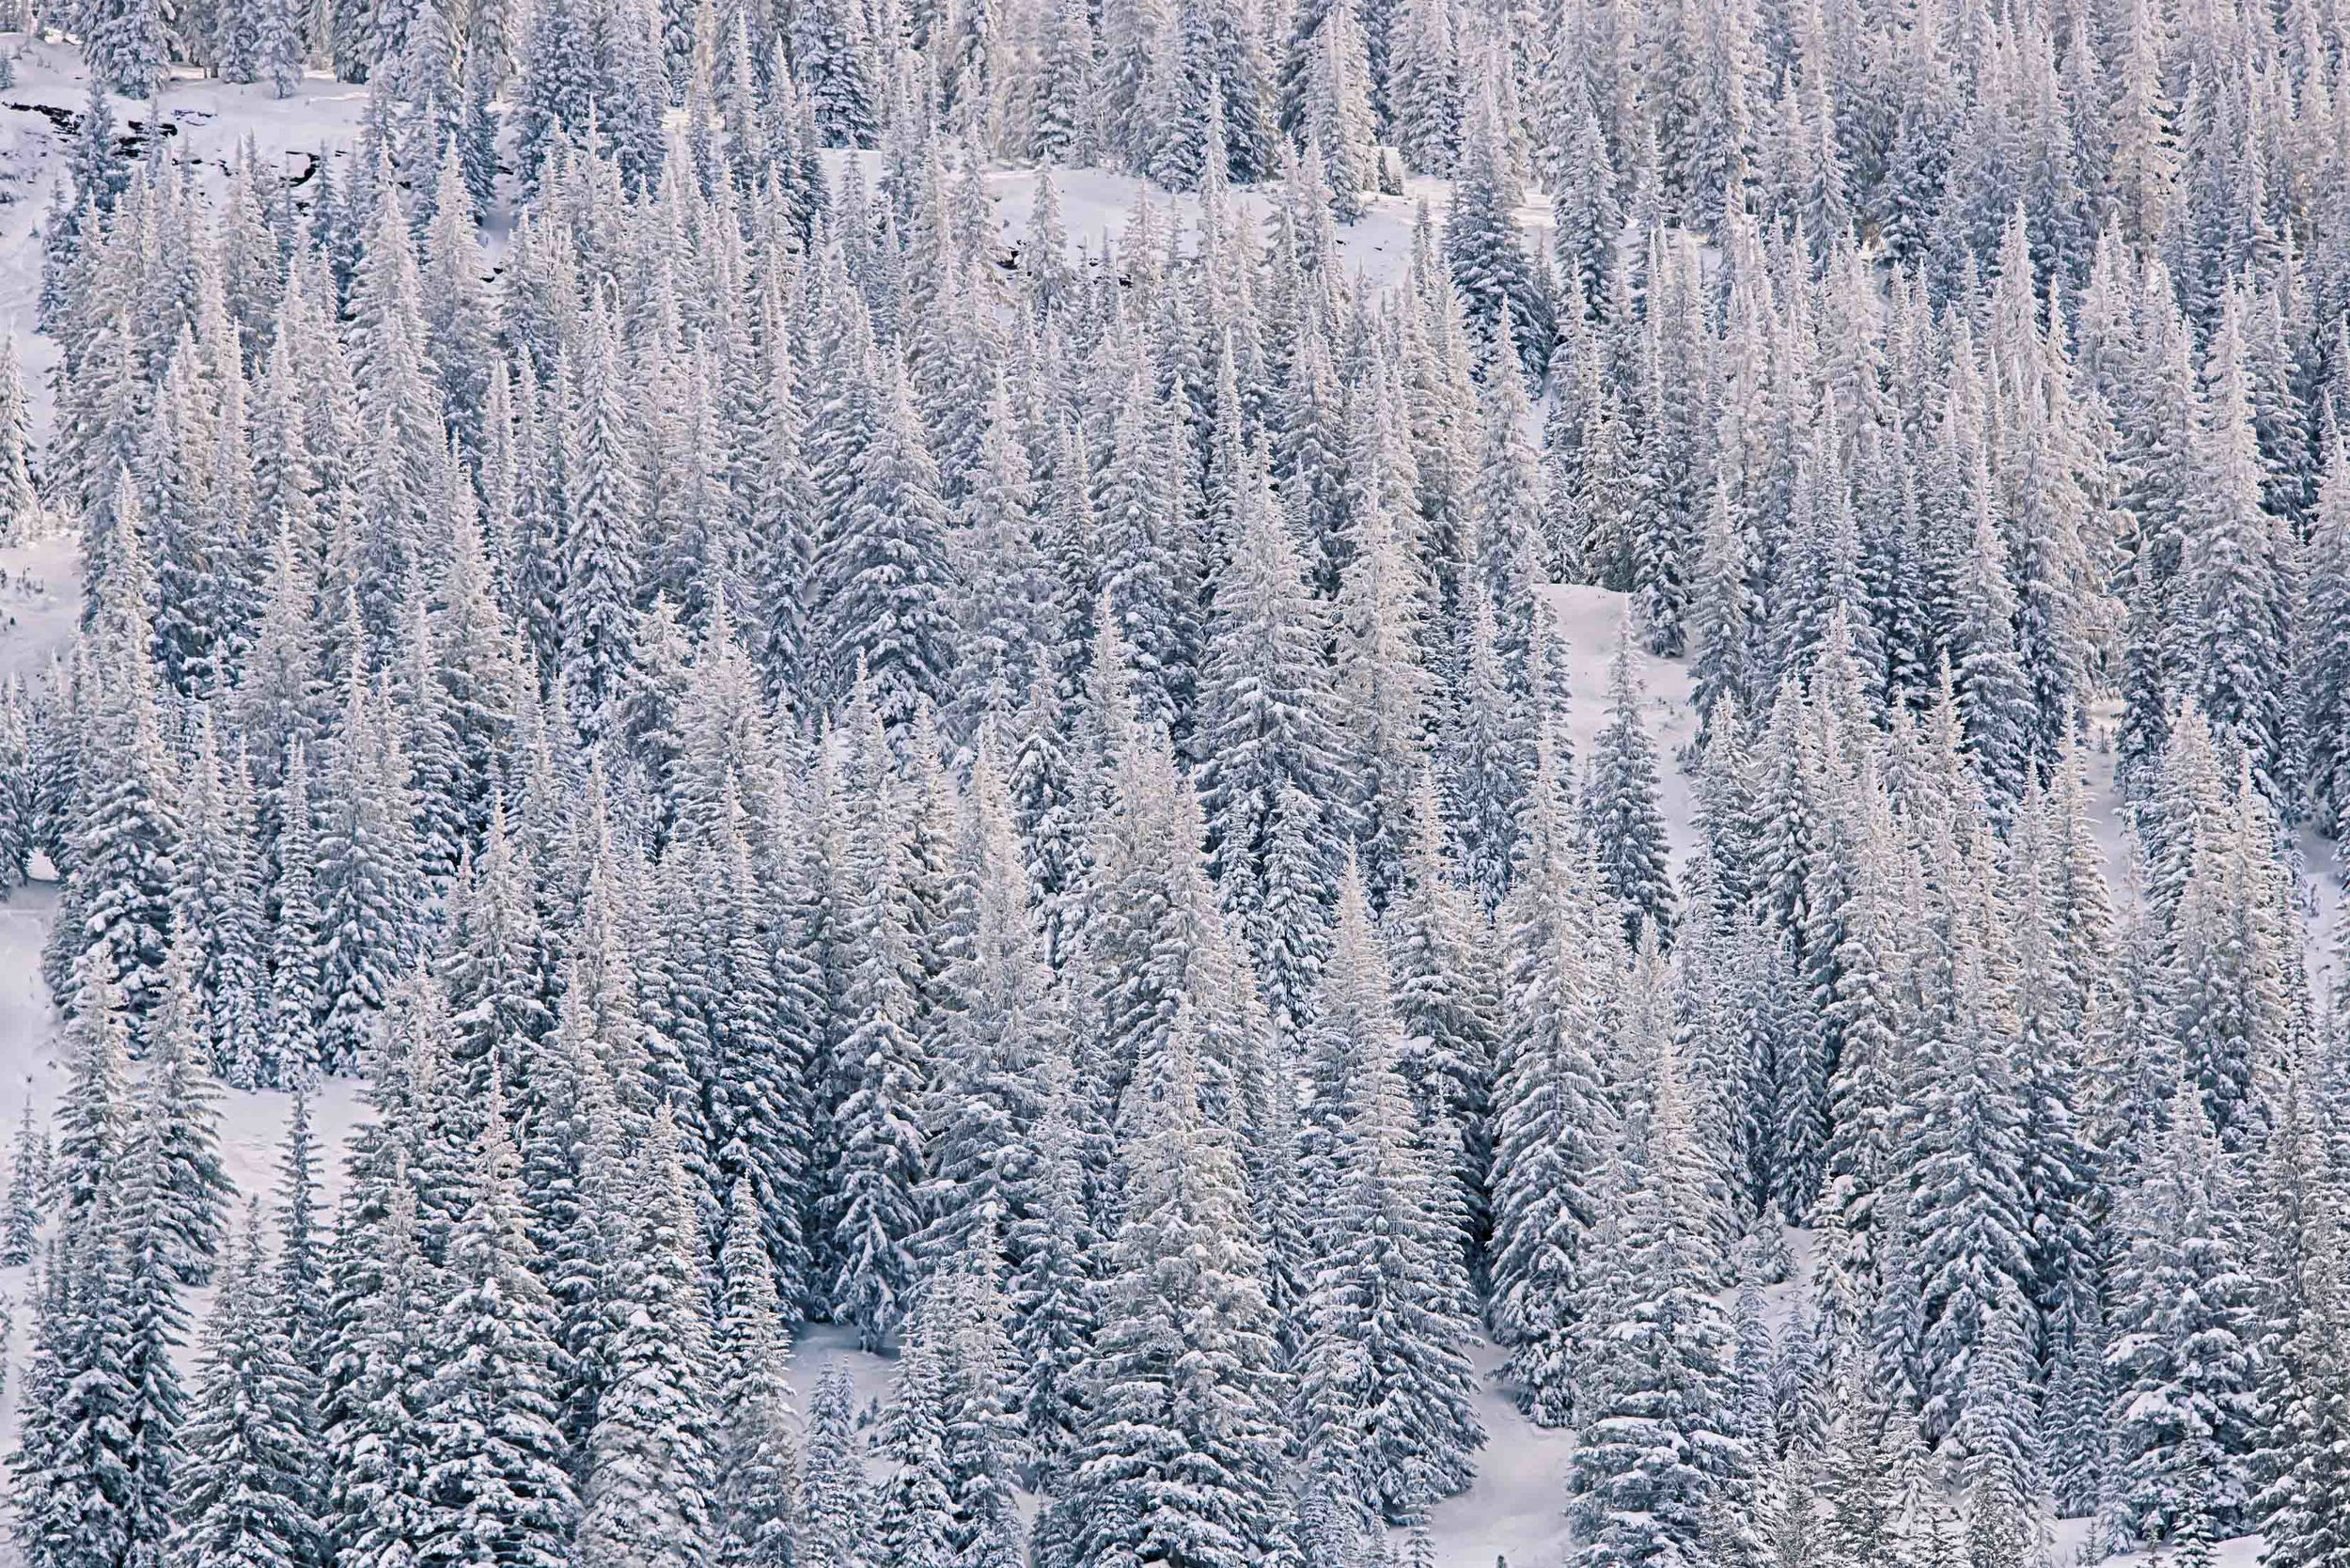 Snowcapped-1.jpg